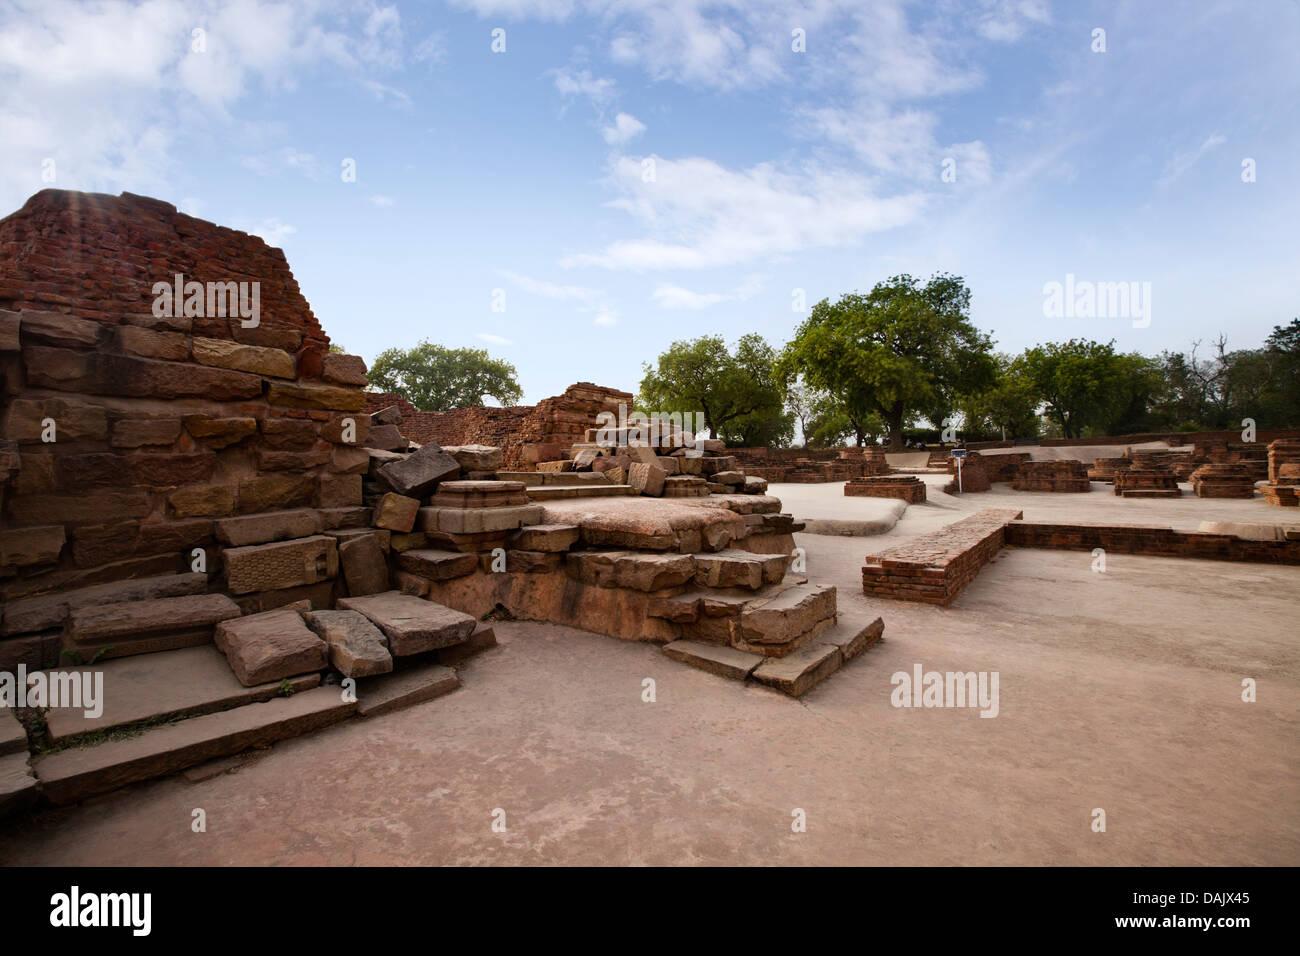 Ruins at archaeological site, Mulagandha Kuti Vihar Temple, Sarnath, Varanasi, Uttar Pradesh, India - Stock Image